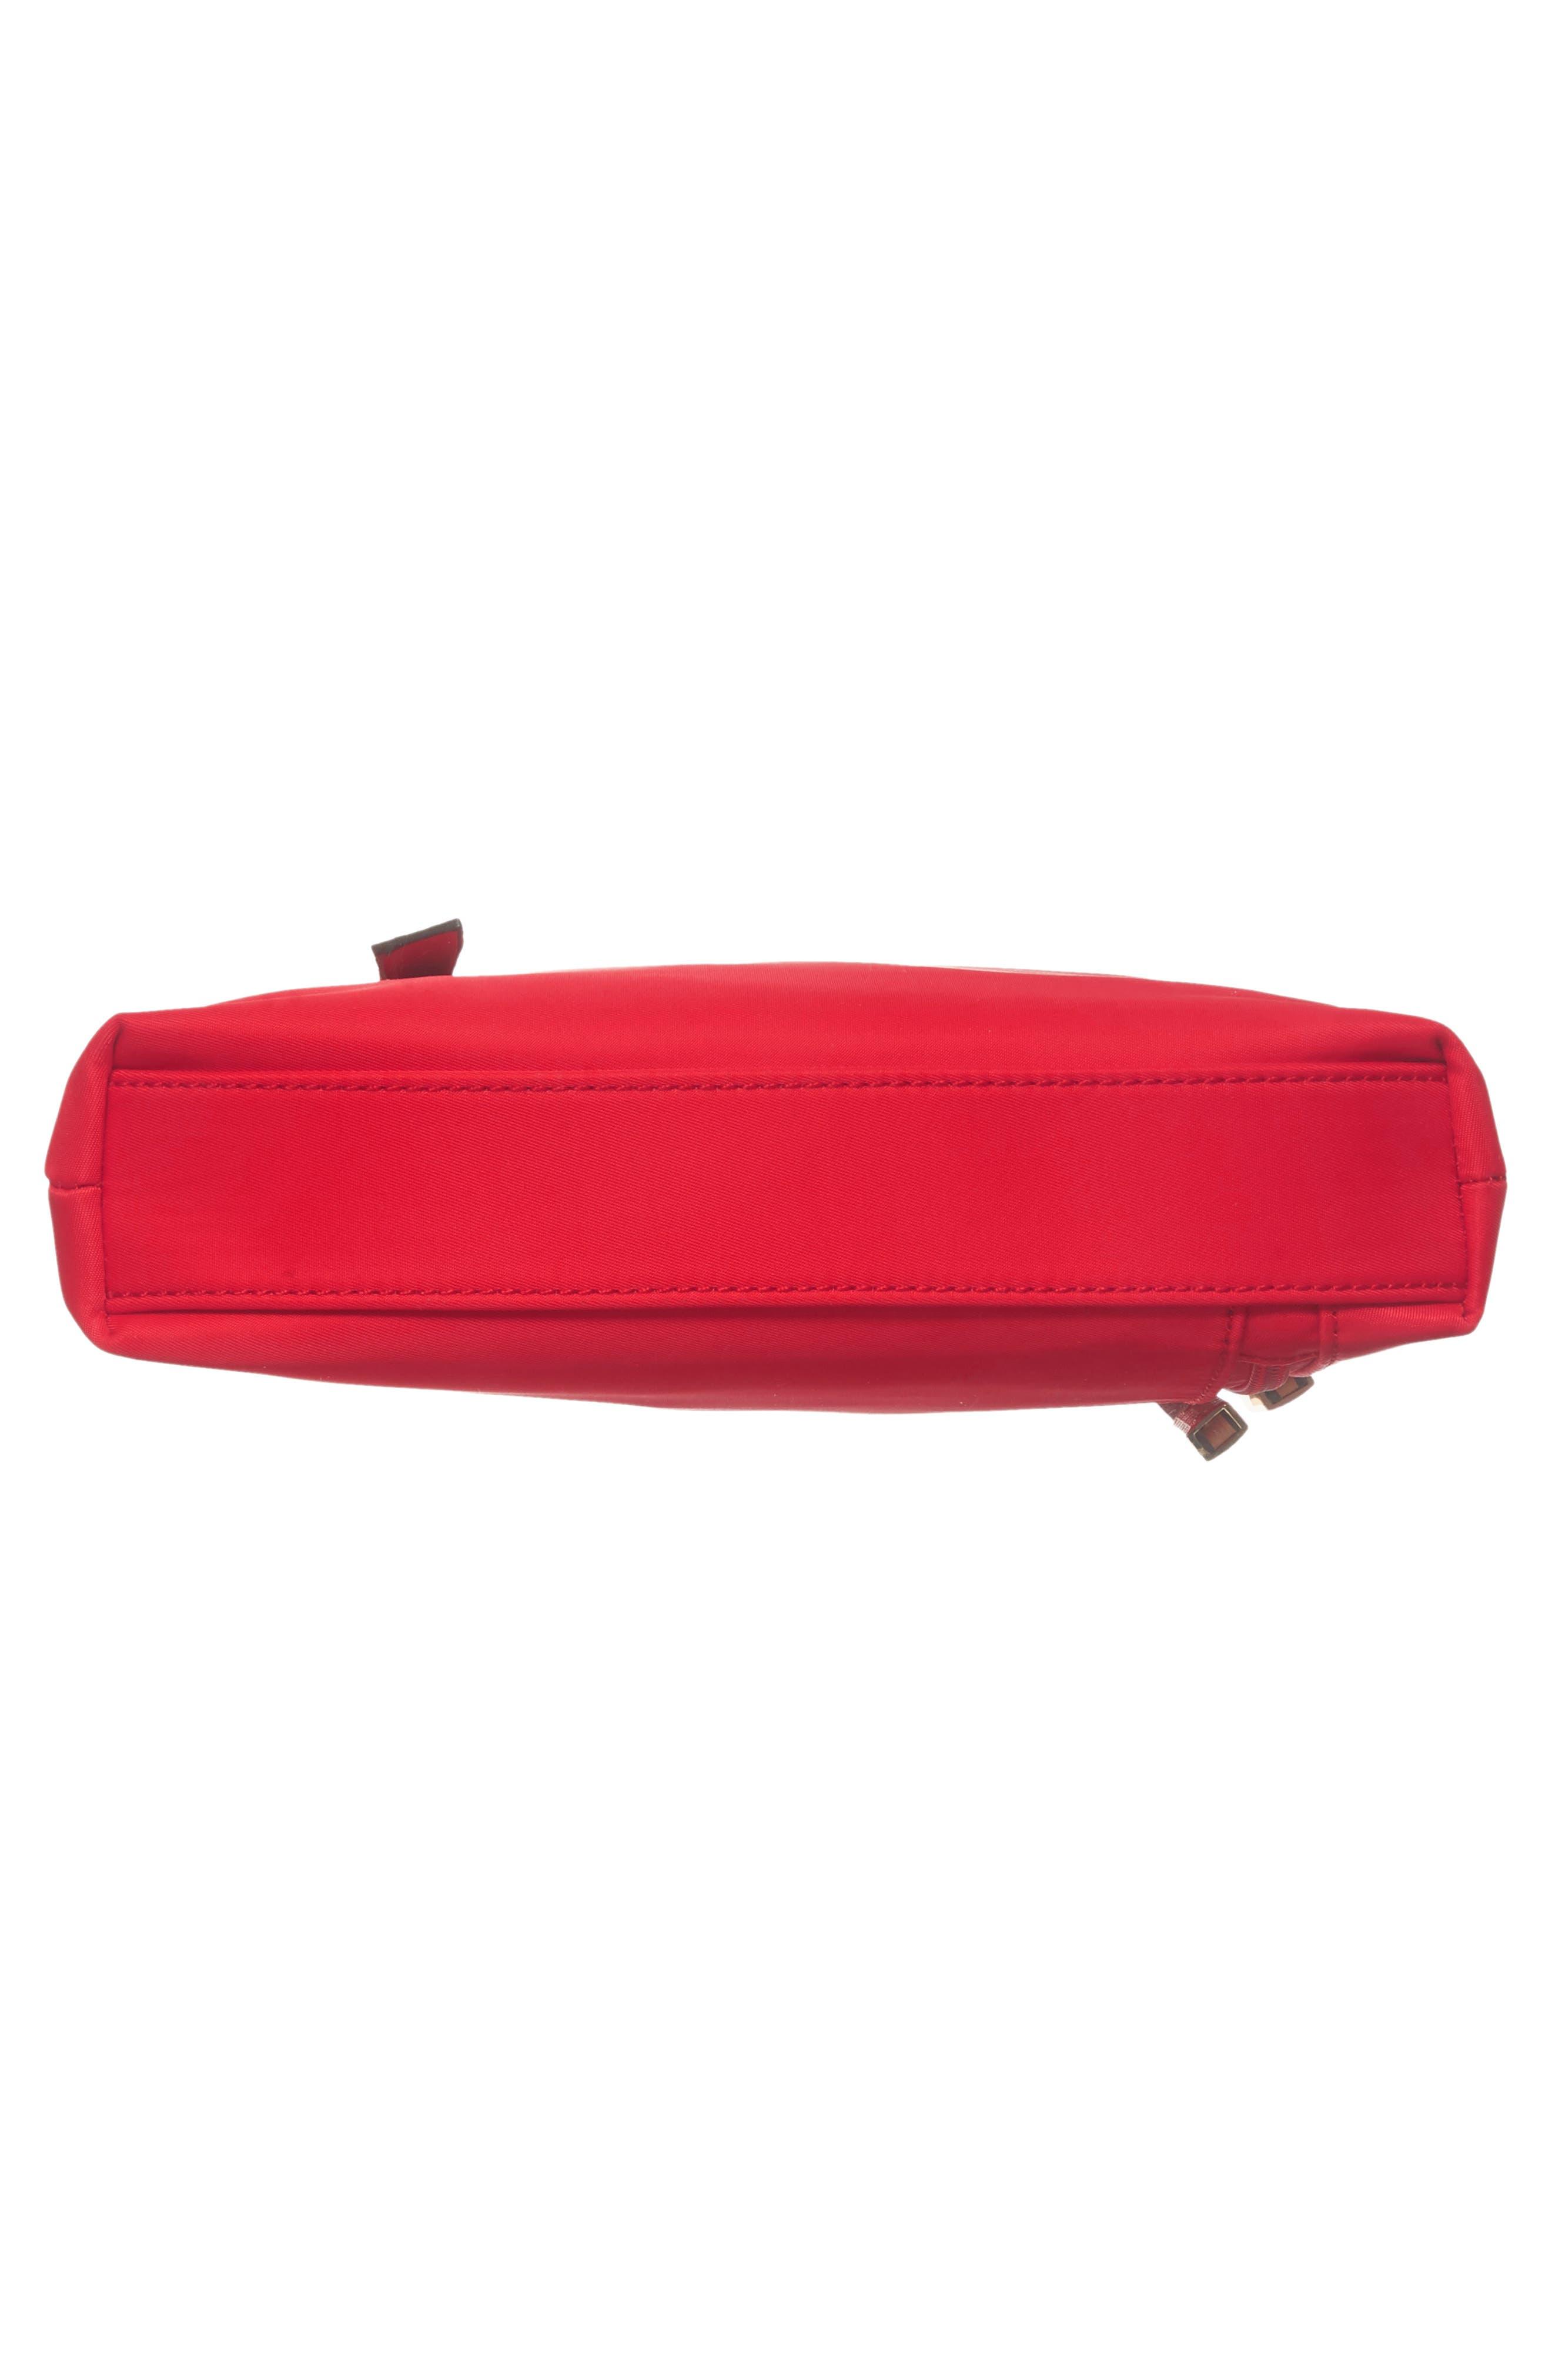 Guitar Strap Crossbody Bag,                             Alternate thumbnail 6, color,                             Red